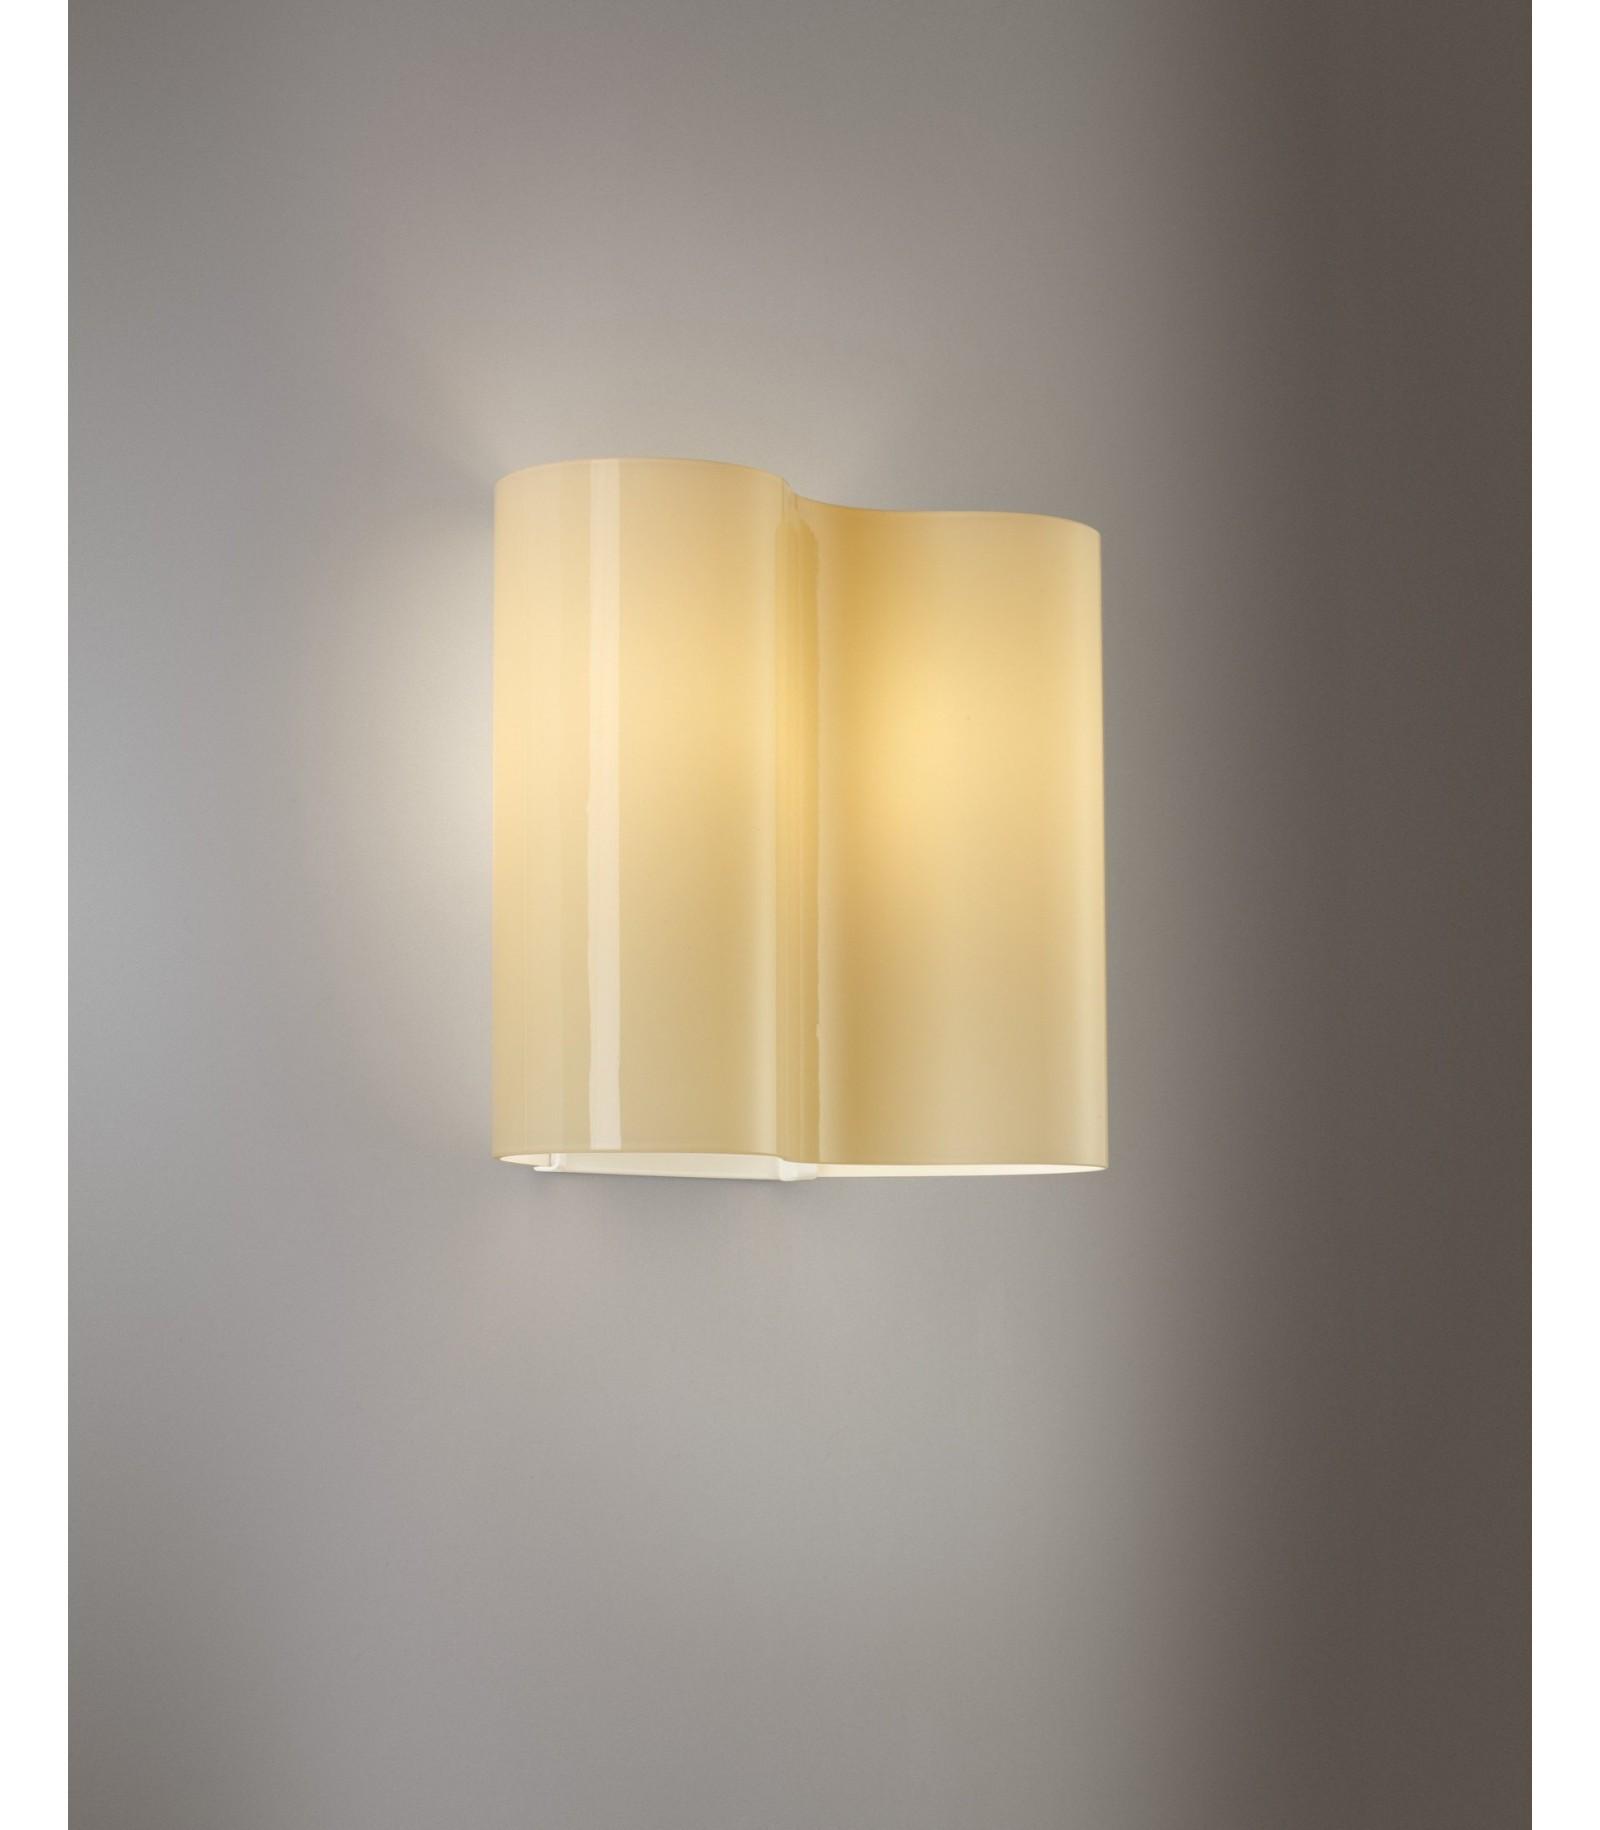 Lampada da parete foscarini double 07 - Lampade design parete ...